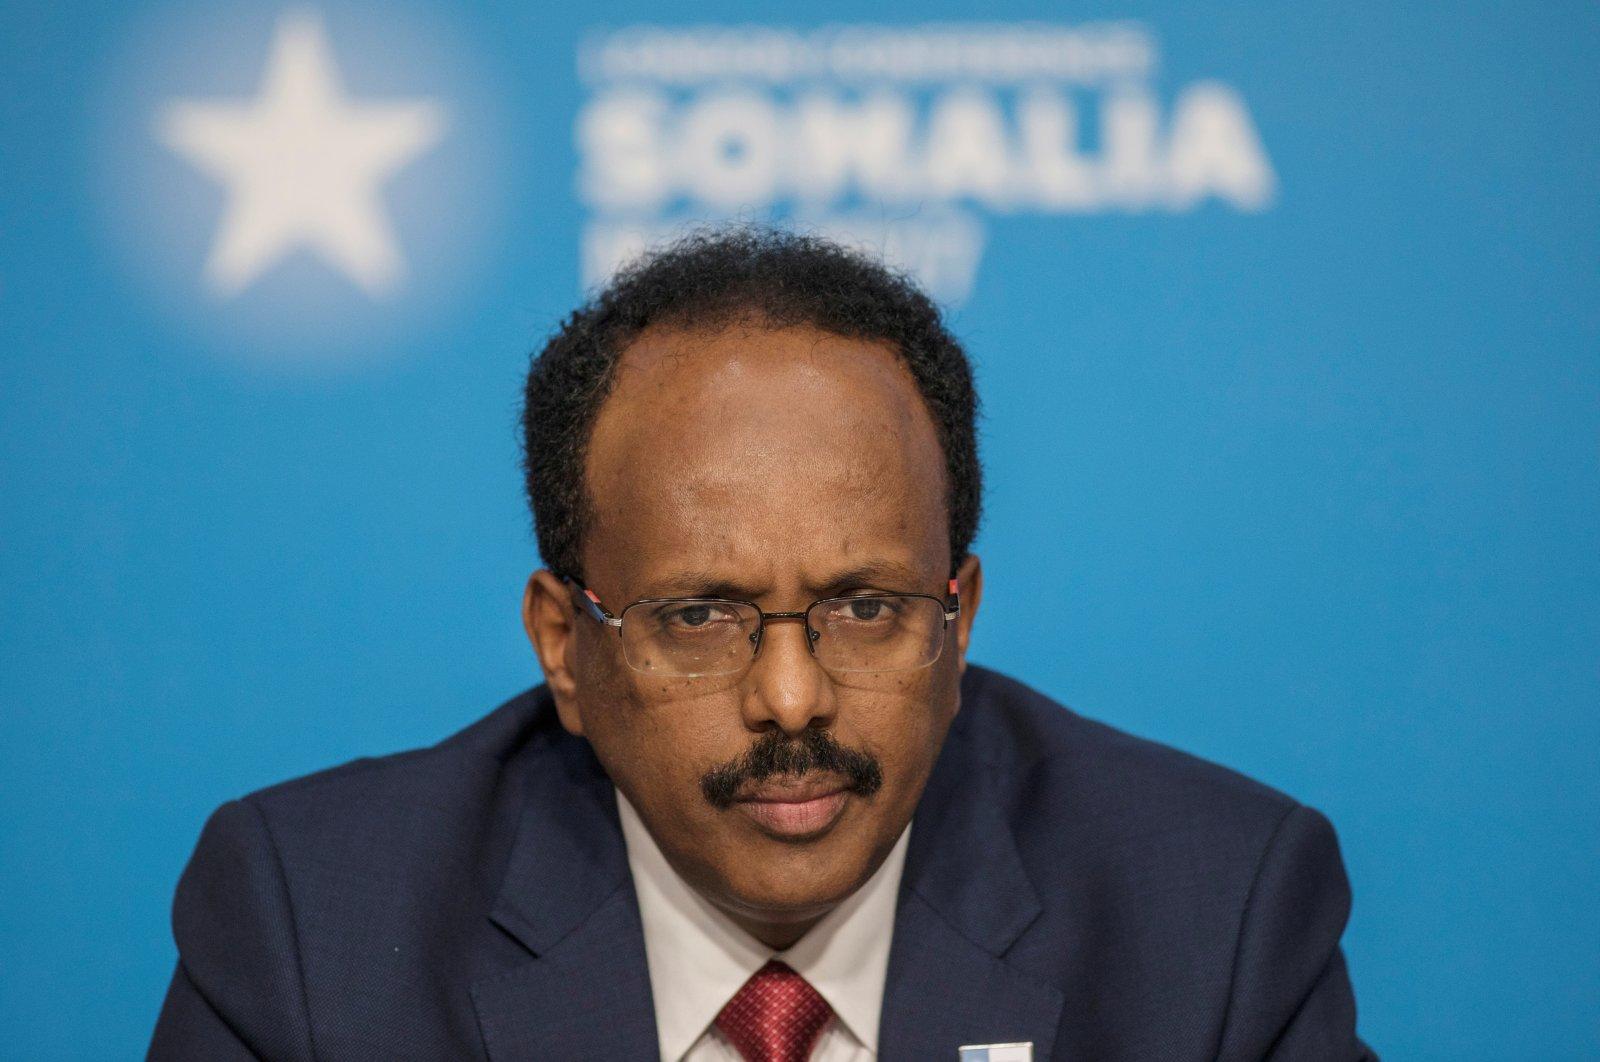 Mohamed Abdullahi Mohamed, President of Somalia, attends the London Somalia Conference' at Lancaster House, U.K. on May 11, 2017. (REUTERS Photo)